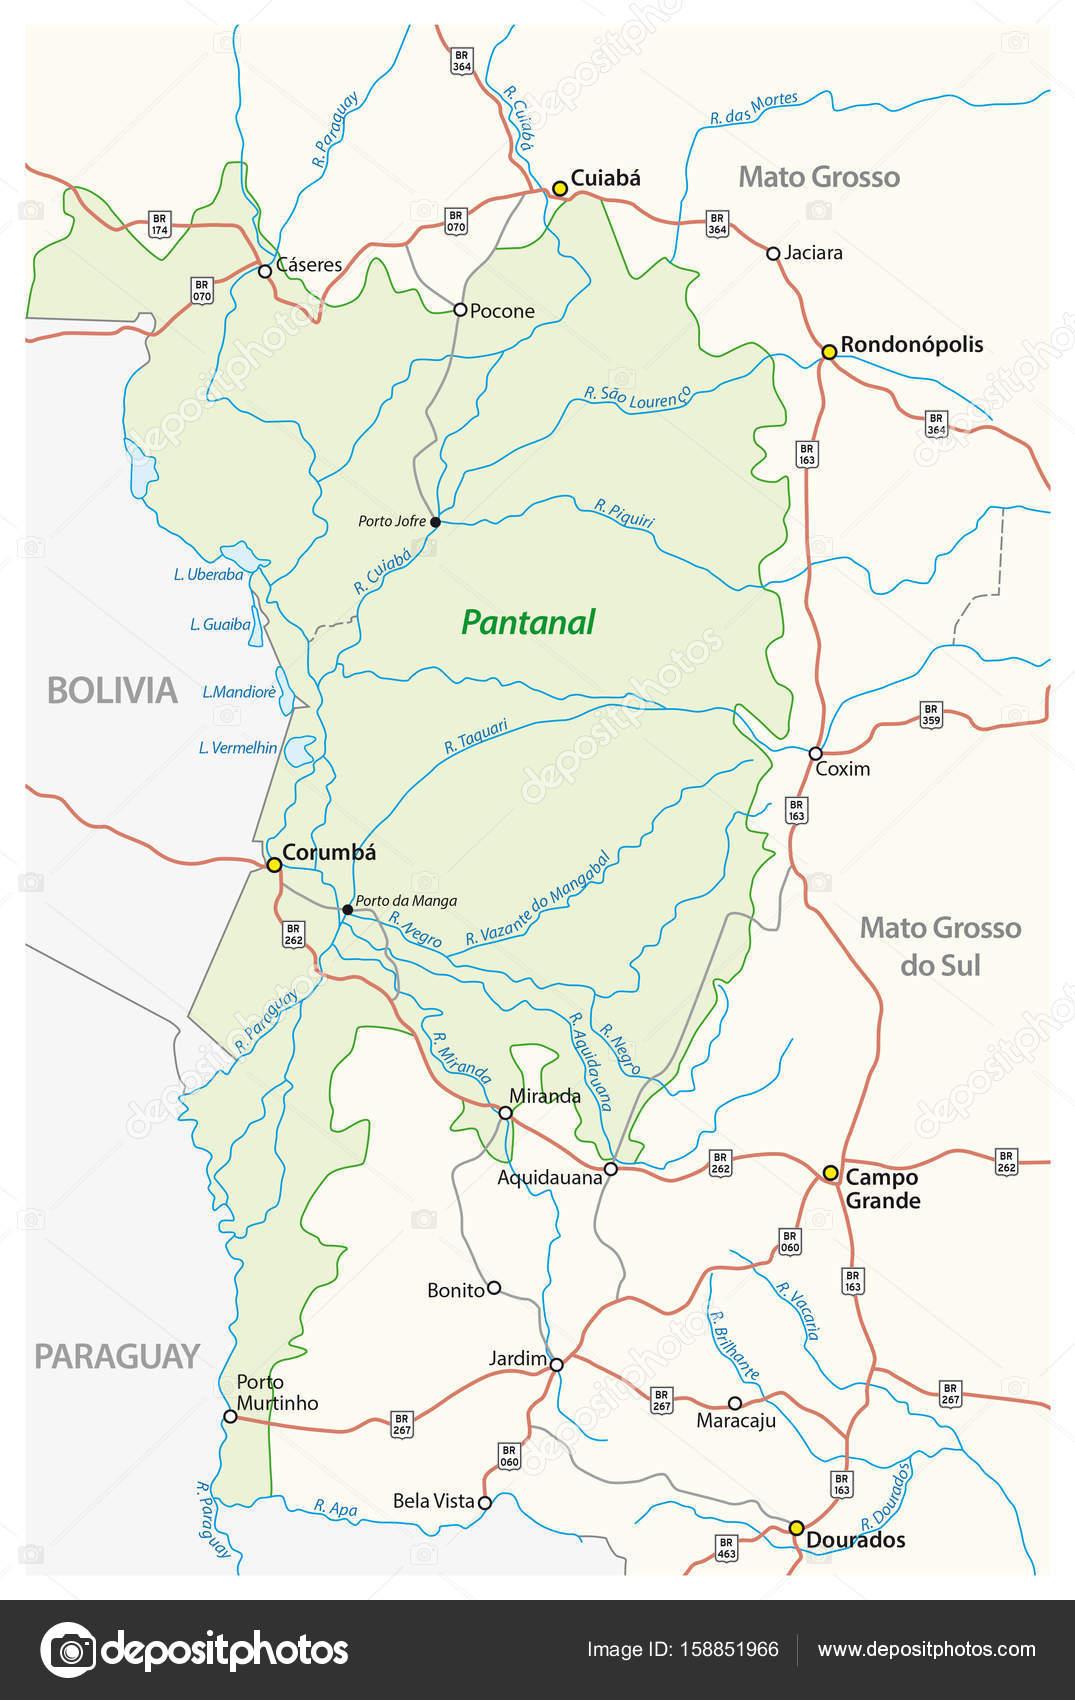 Brasilien Karte Welt.Karte Pantanal Das Größte Tropische Feuchtgebiet Der Welt